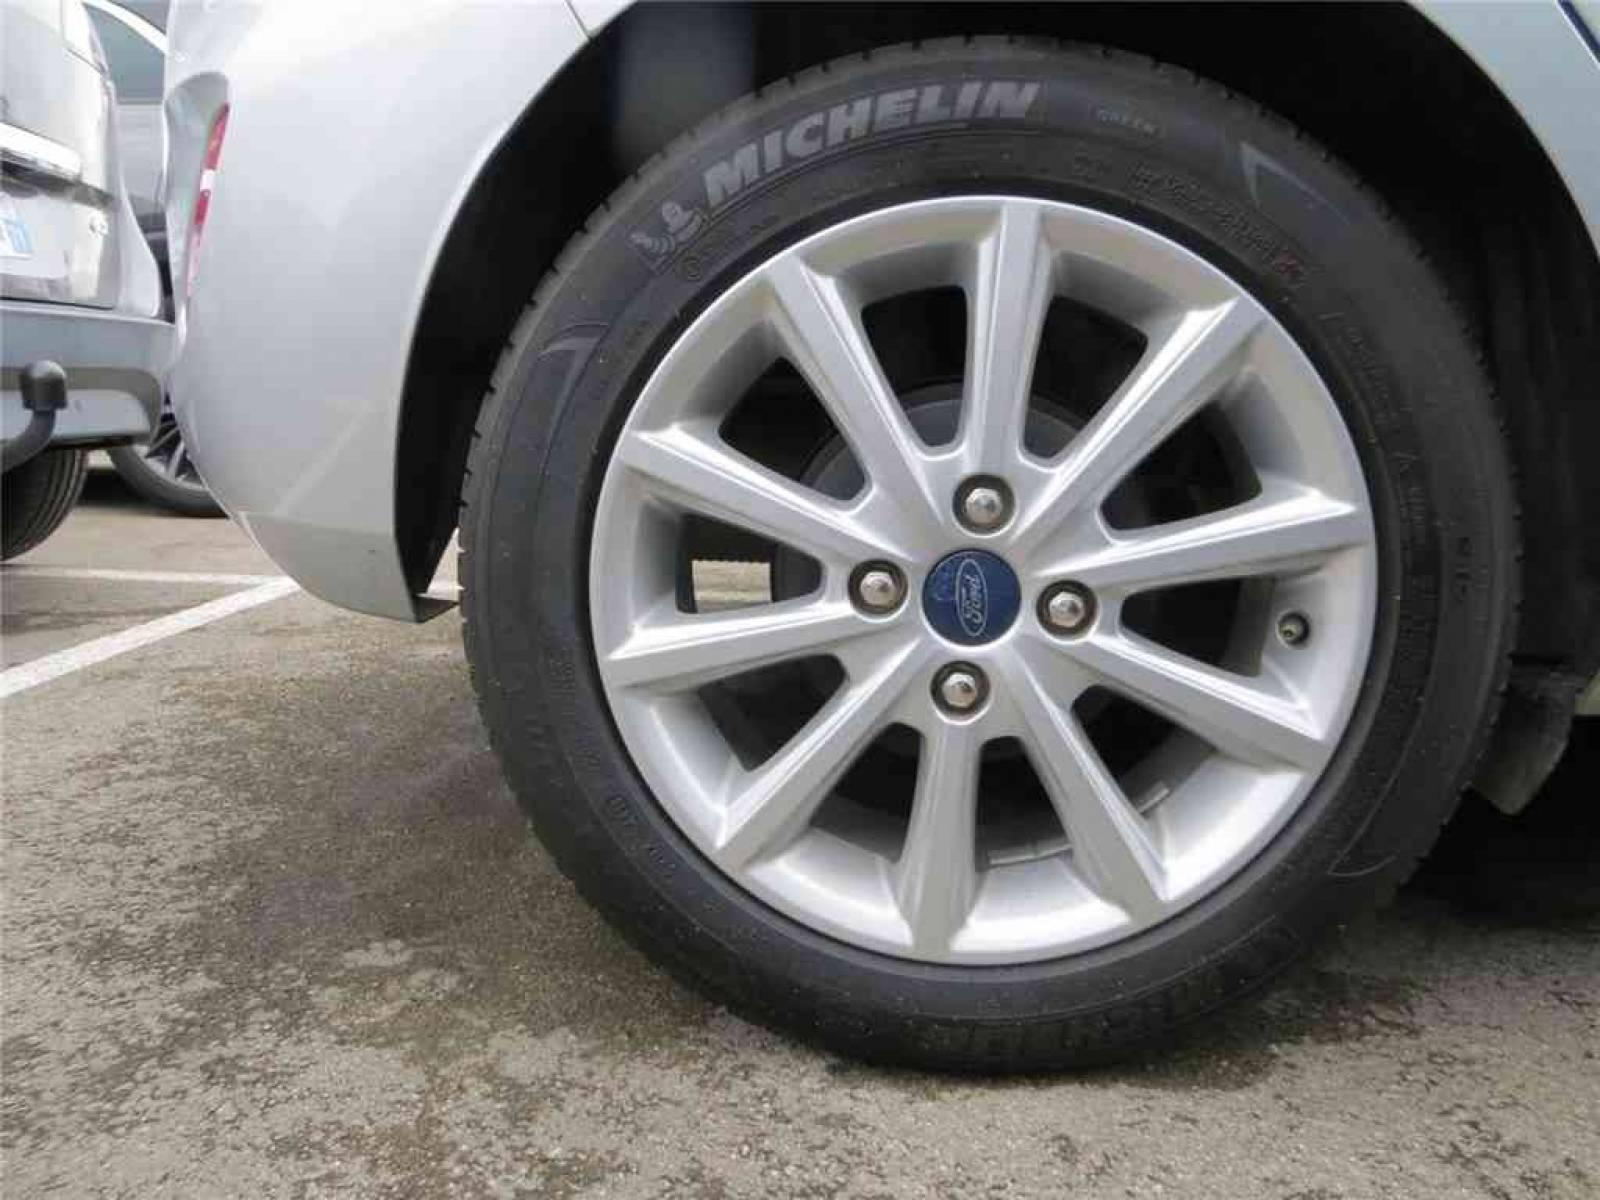 FORD Fiesta 1.0 EcoBoost 100 ch S&S BVM6 - véhicule d'occasion - Groupe Guillet - Opel Magicauto - Chalon-sur-Saône - 71380 - Saint-Marcel - 5